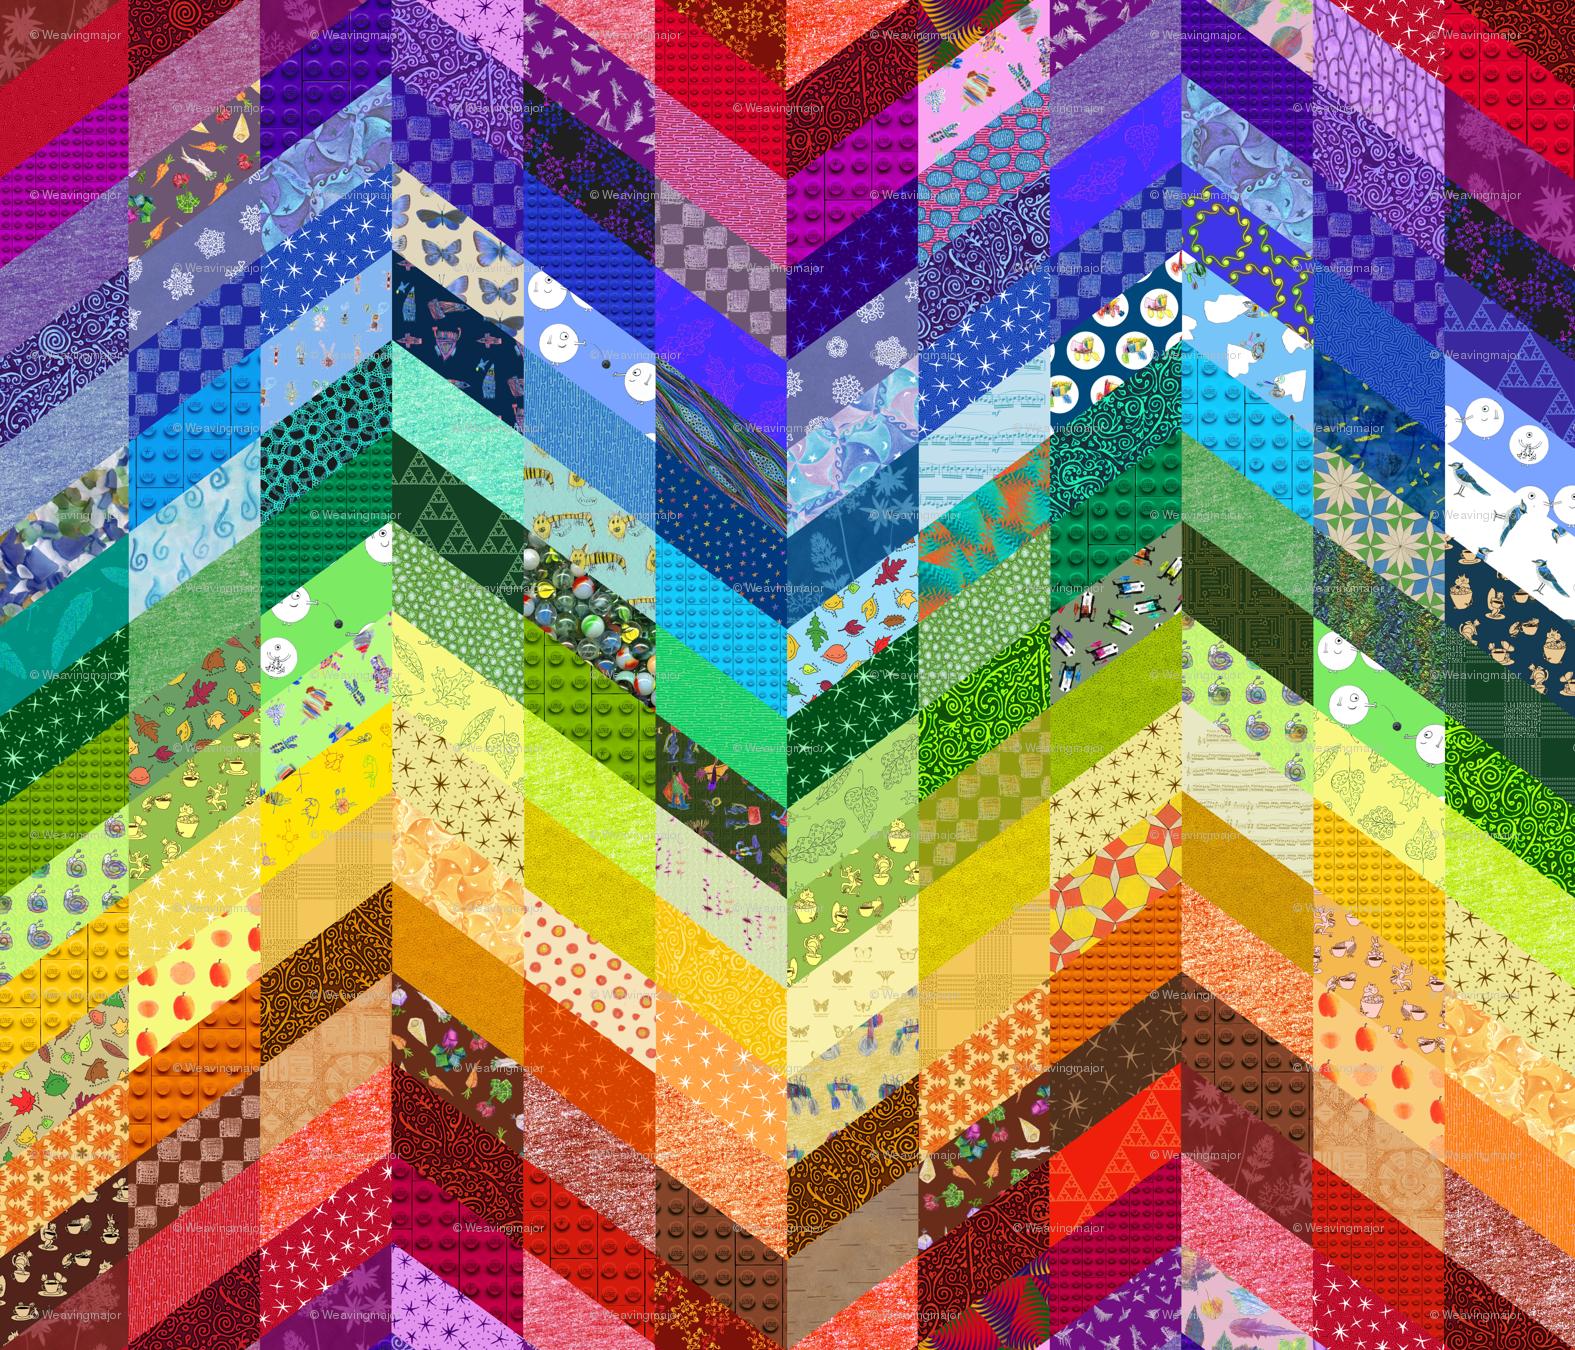 Quilt Wallpaper and Backgrounds - WallpaperSafari